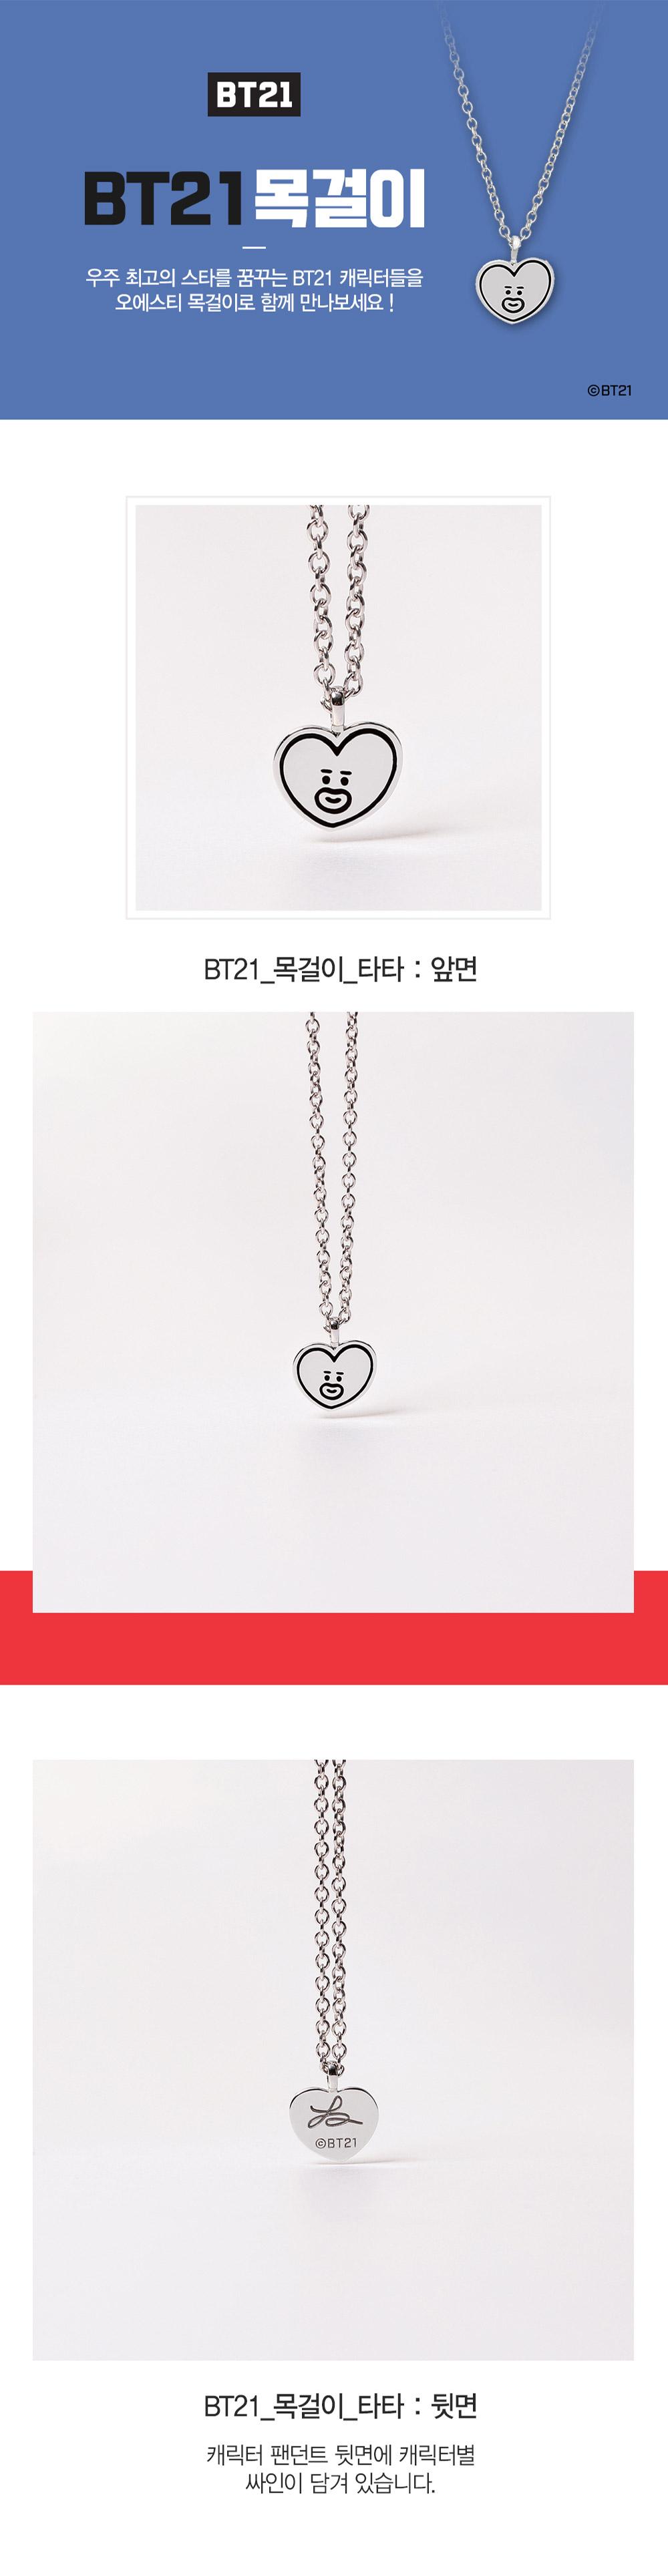 bt21_ost_necklace_01.jpg